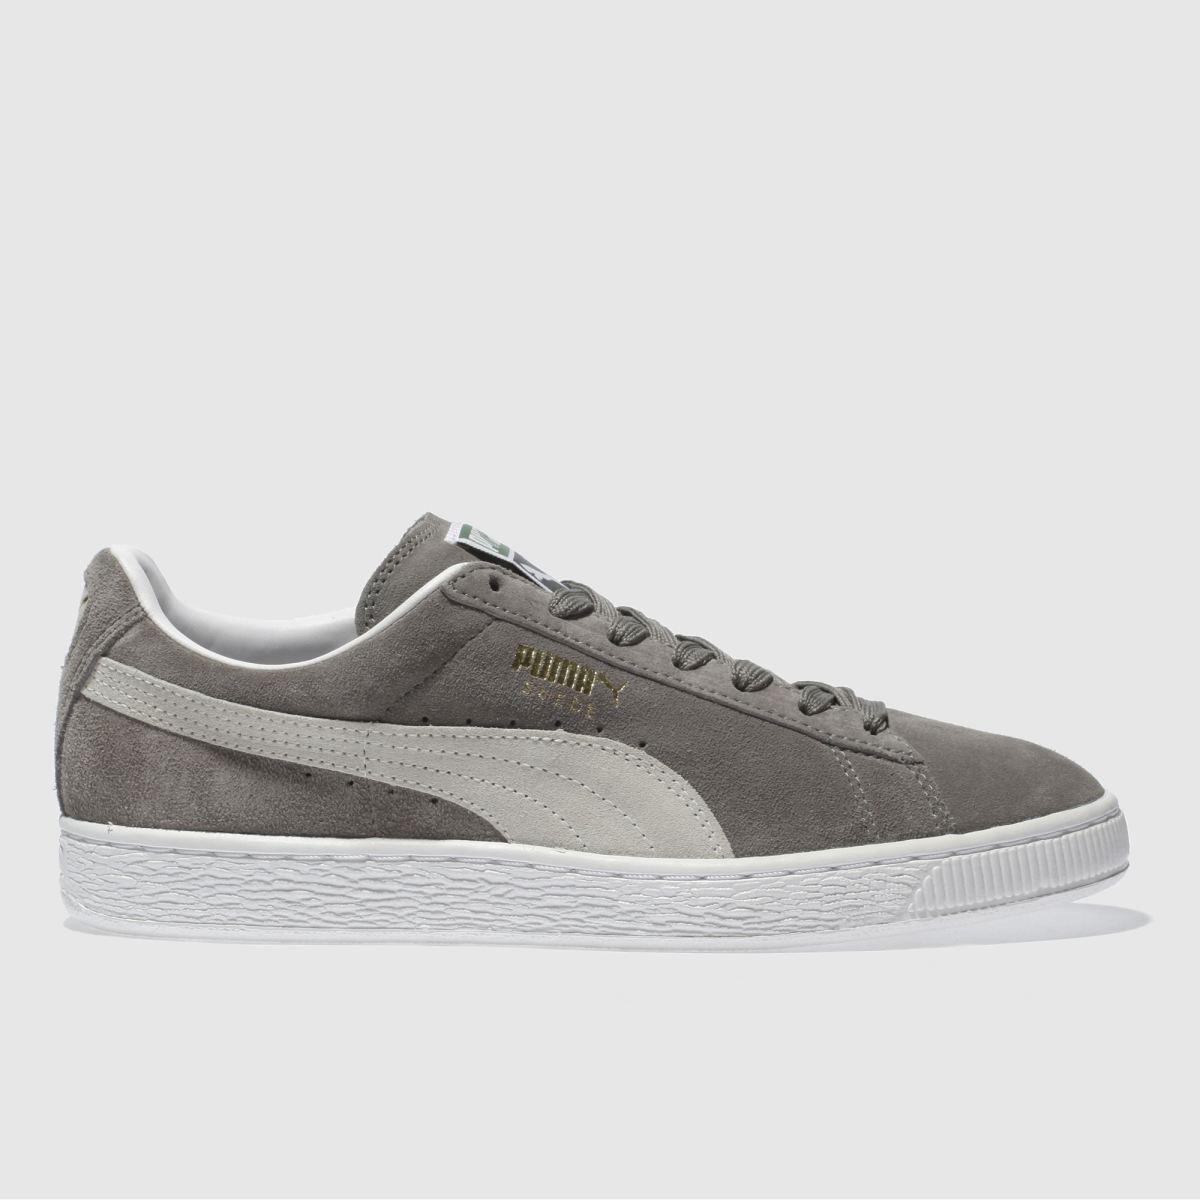 Puma Grey Suede Classic Eco Trainers